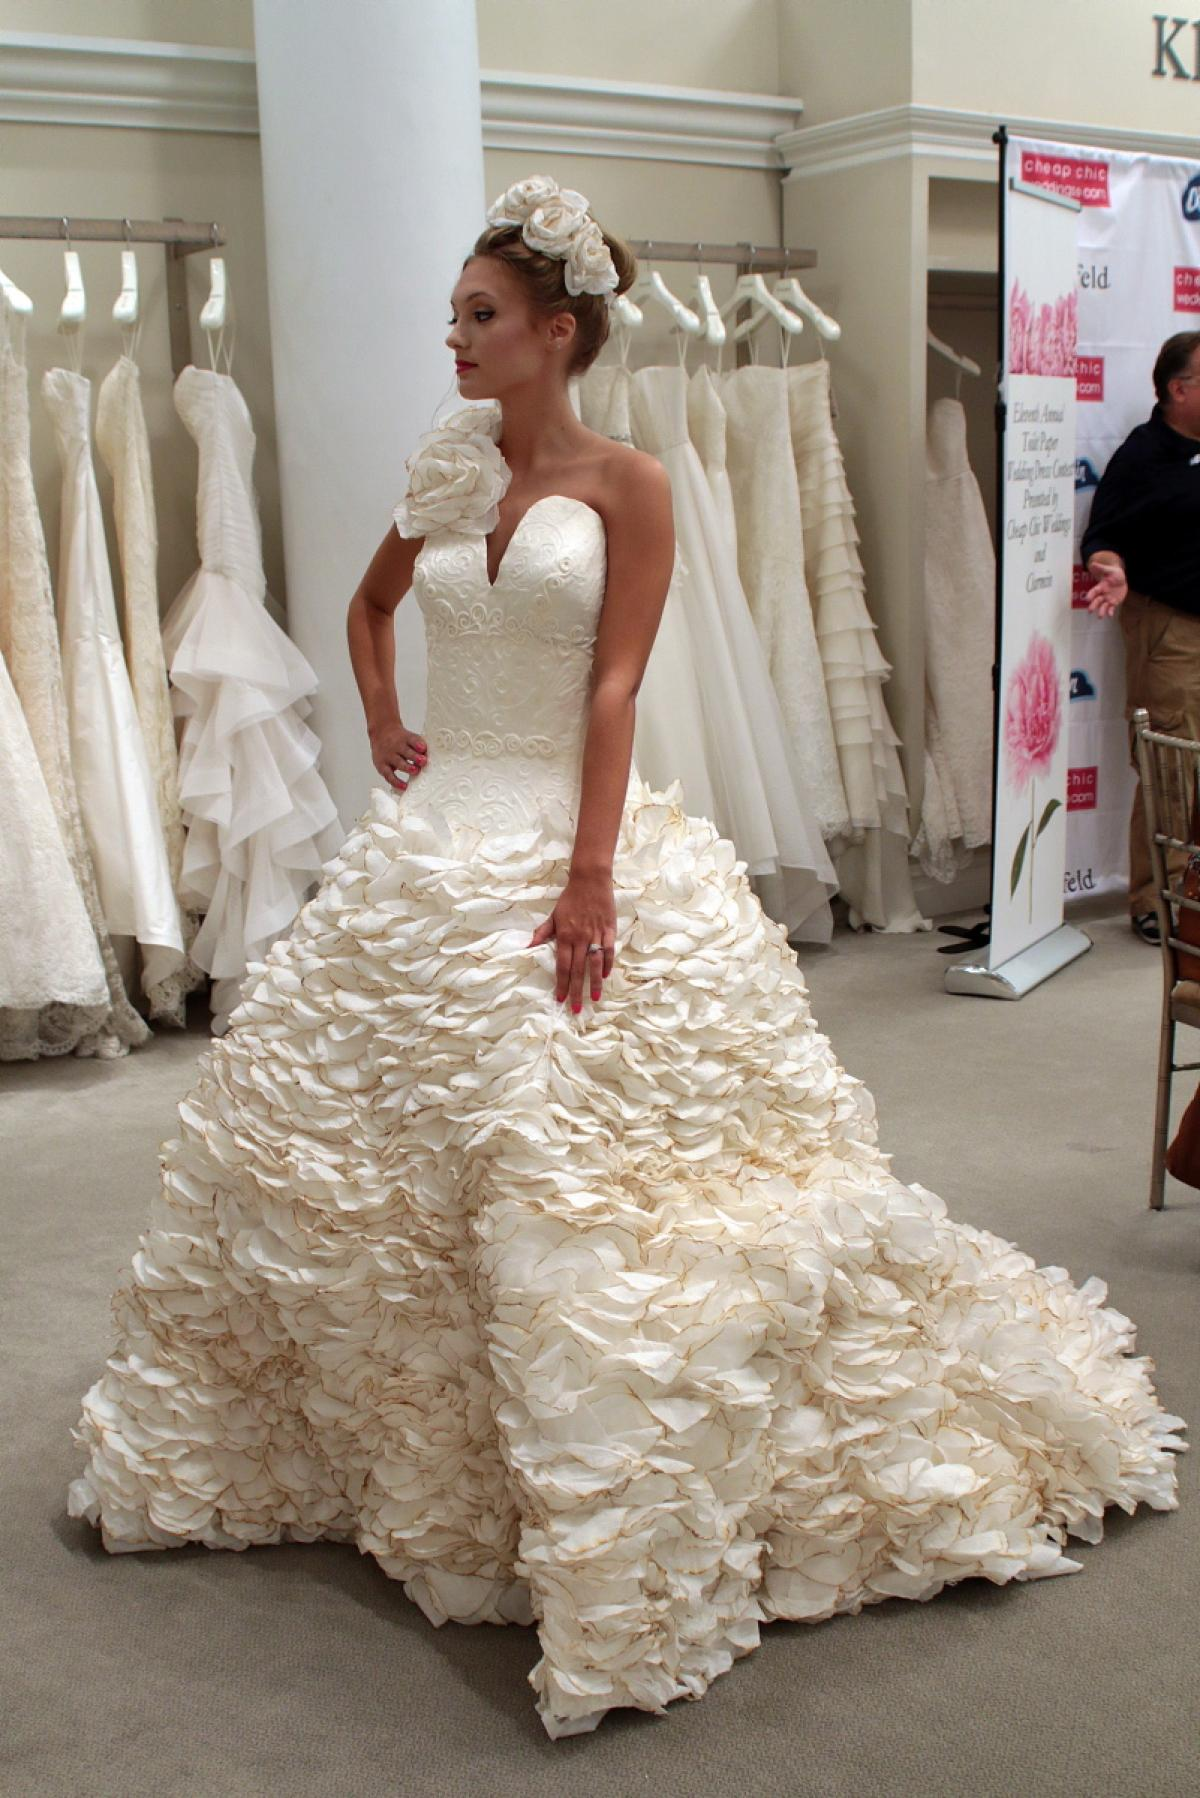 Chic Wedding Dress Contest : Th annual cheap chic weddings toilet paper wedding dress contest g